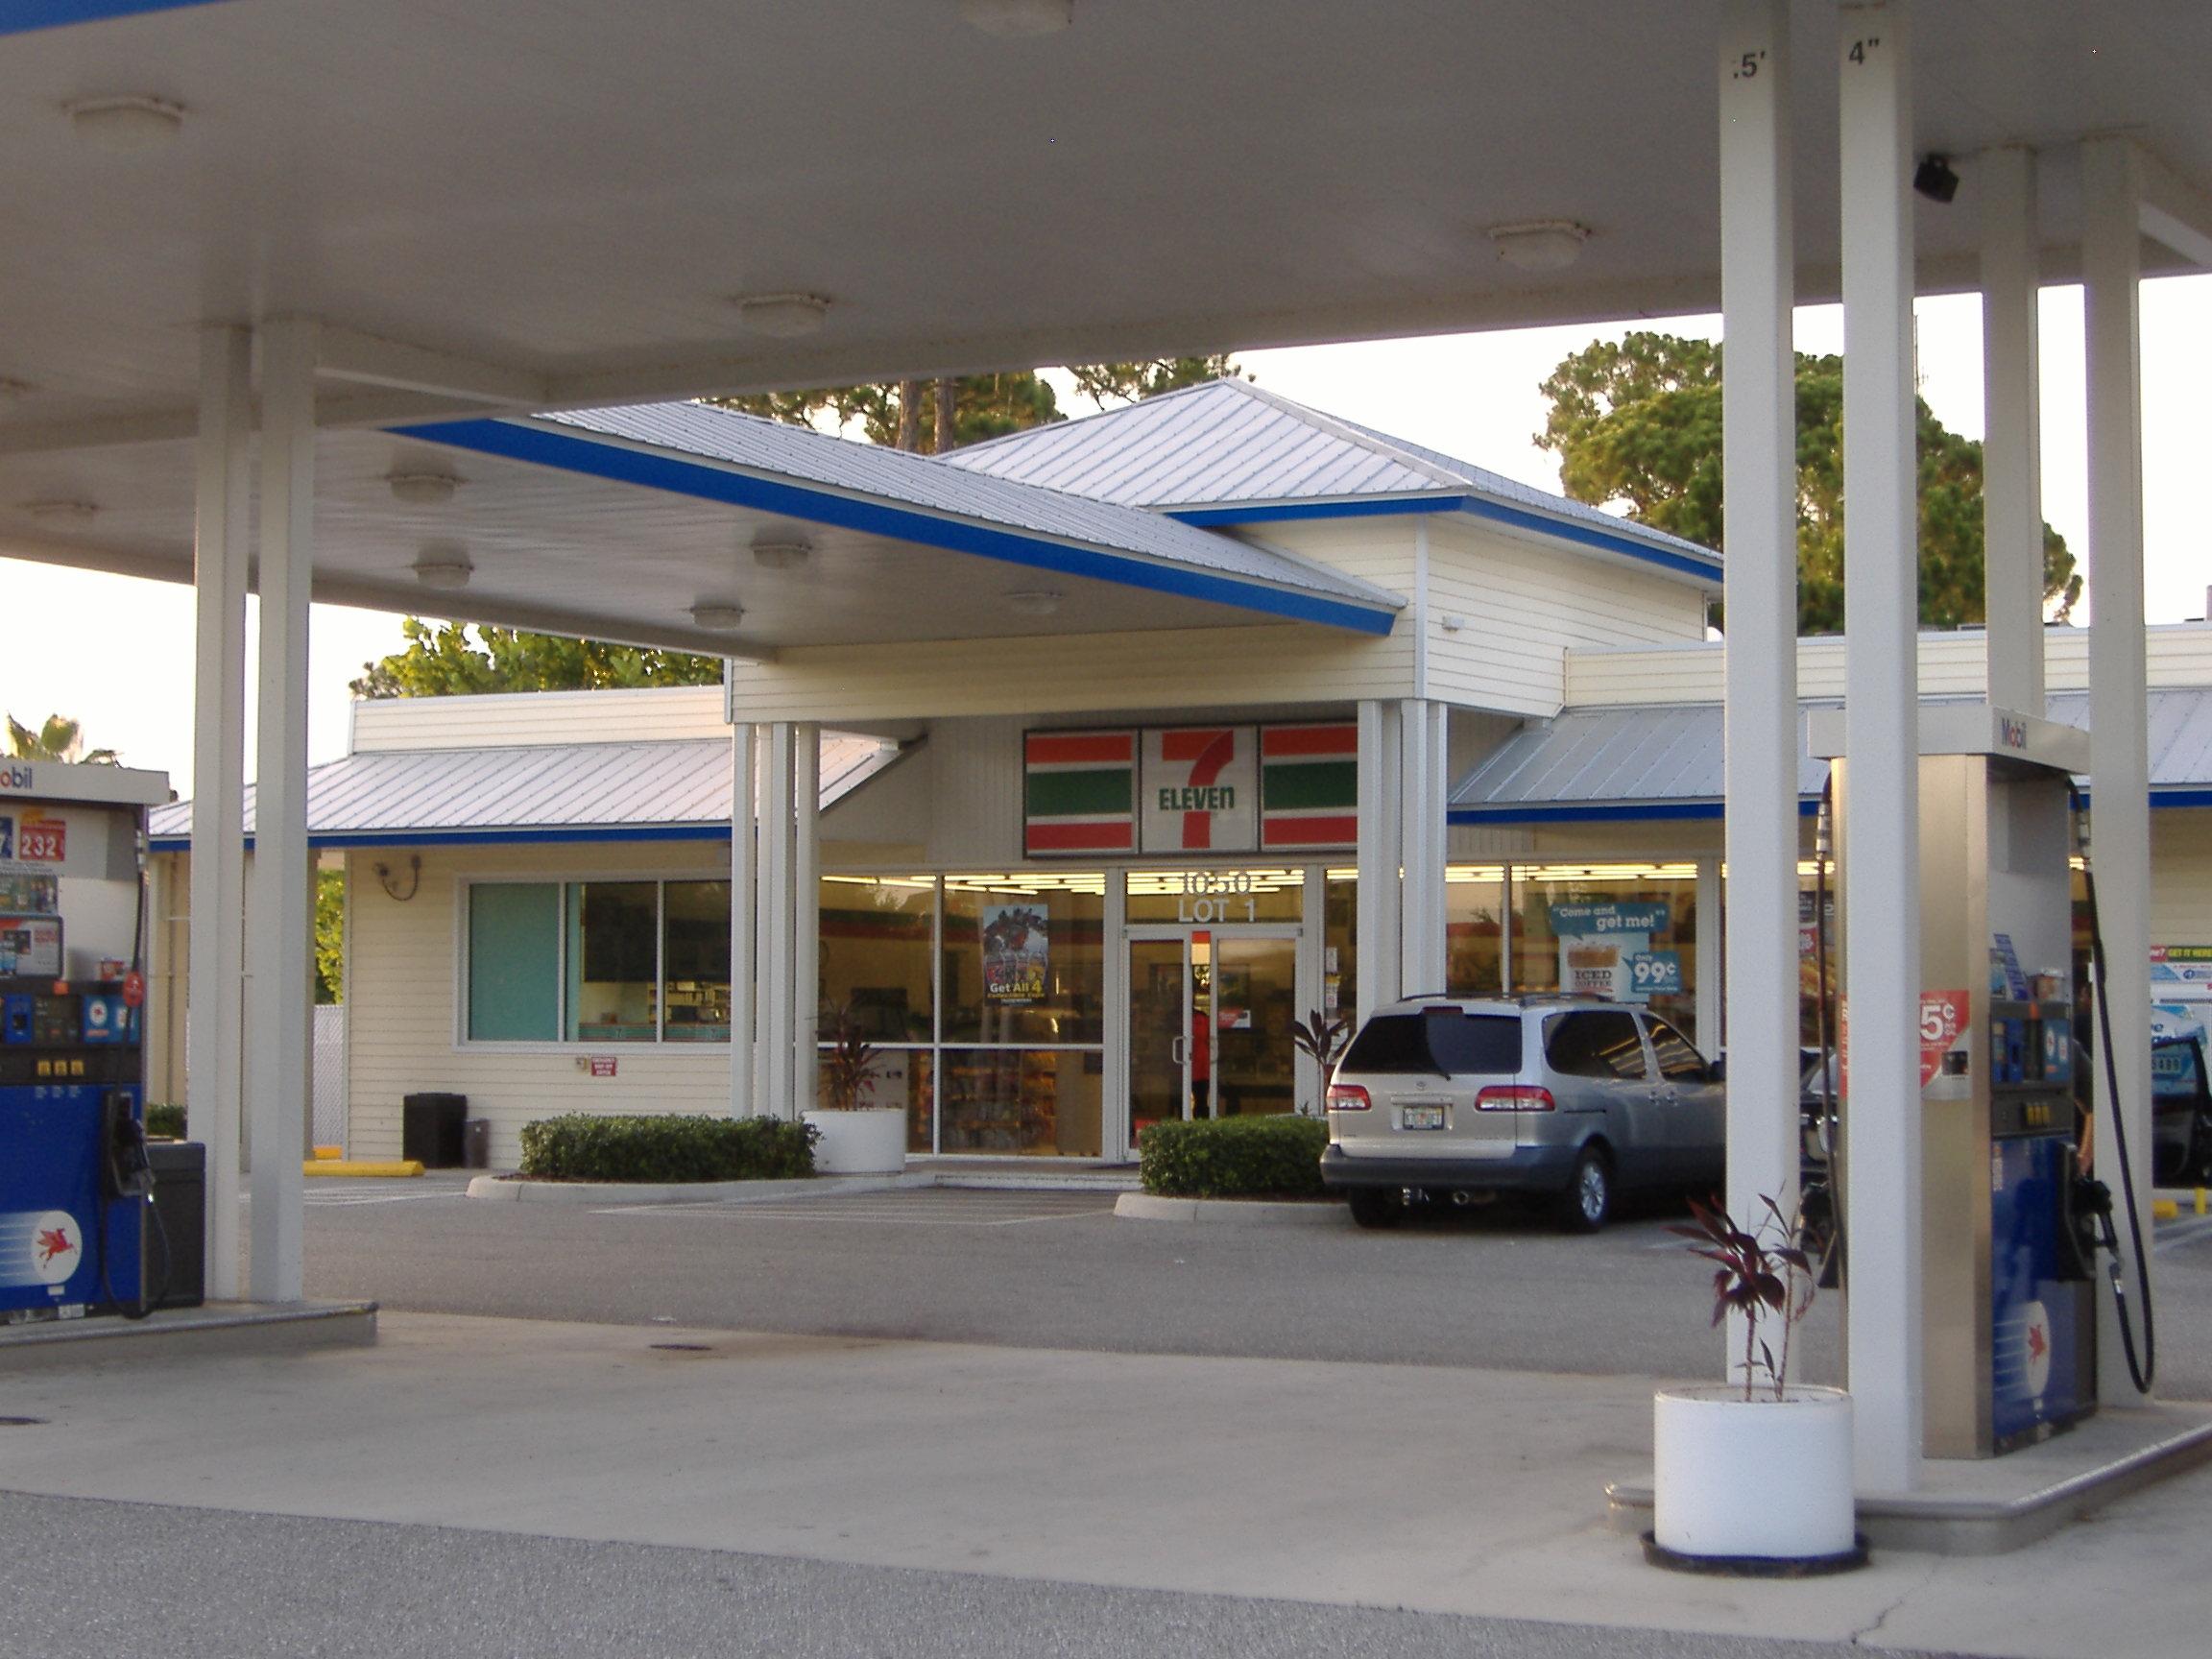 7-11 Bobcat Convenience - Gas Station -